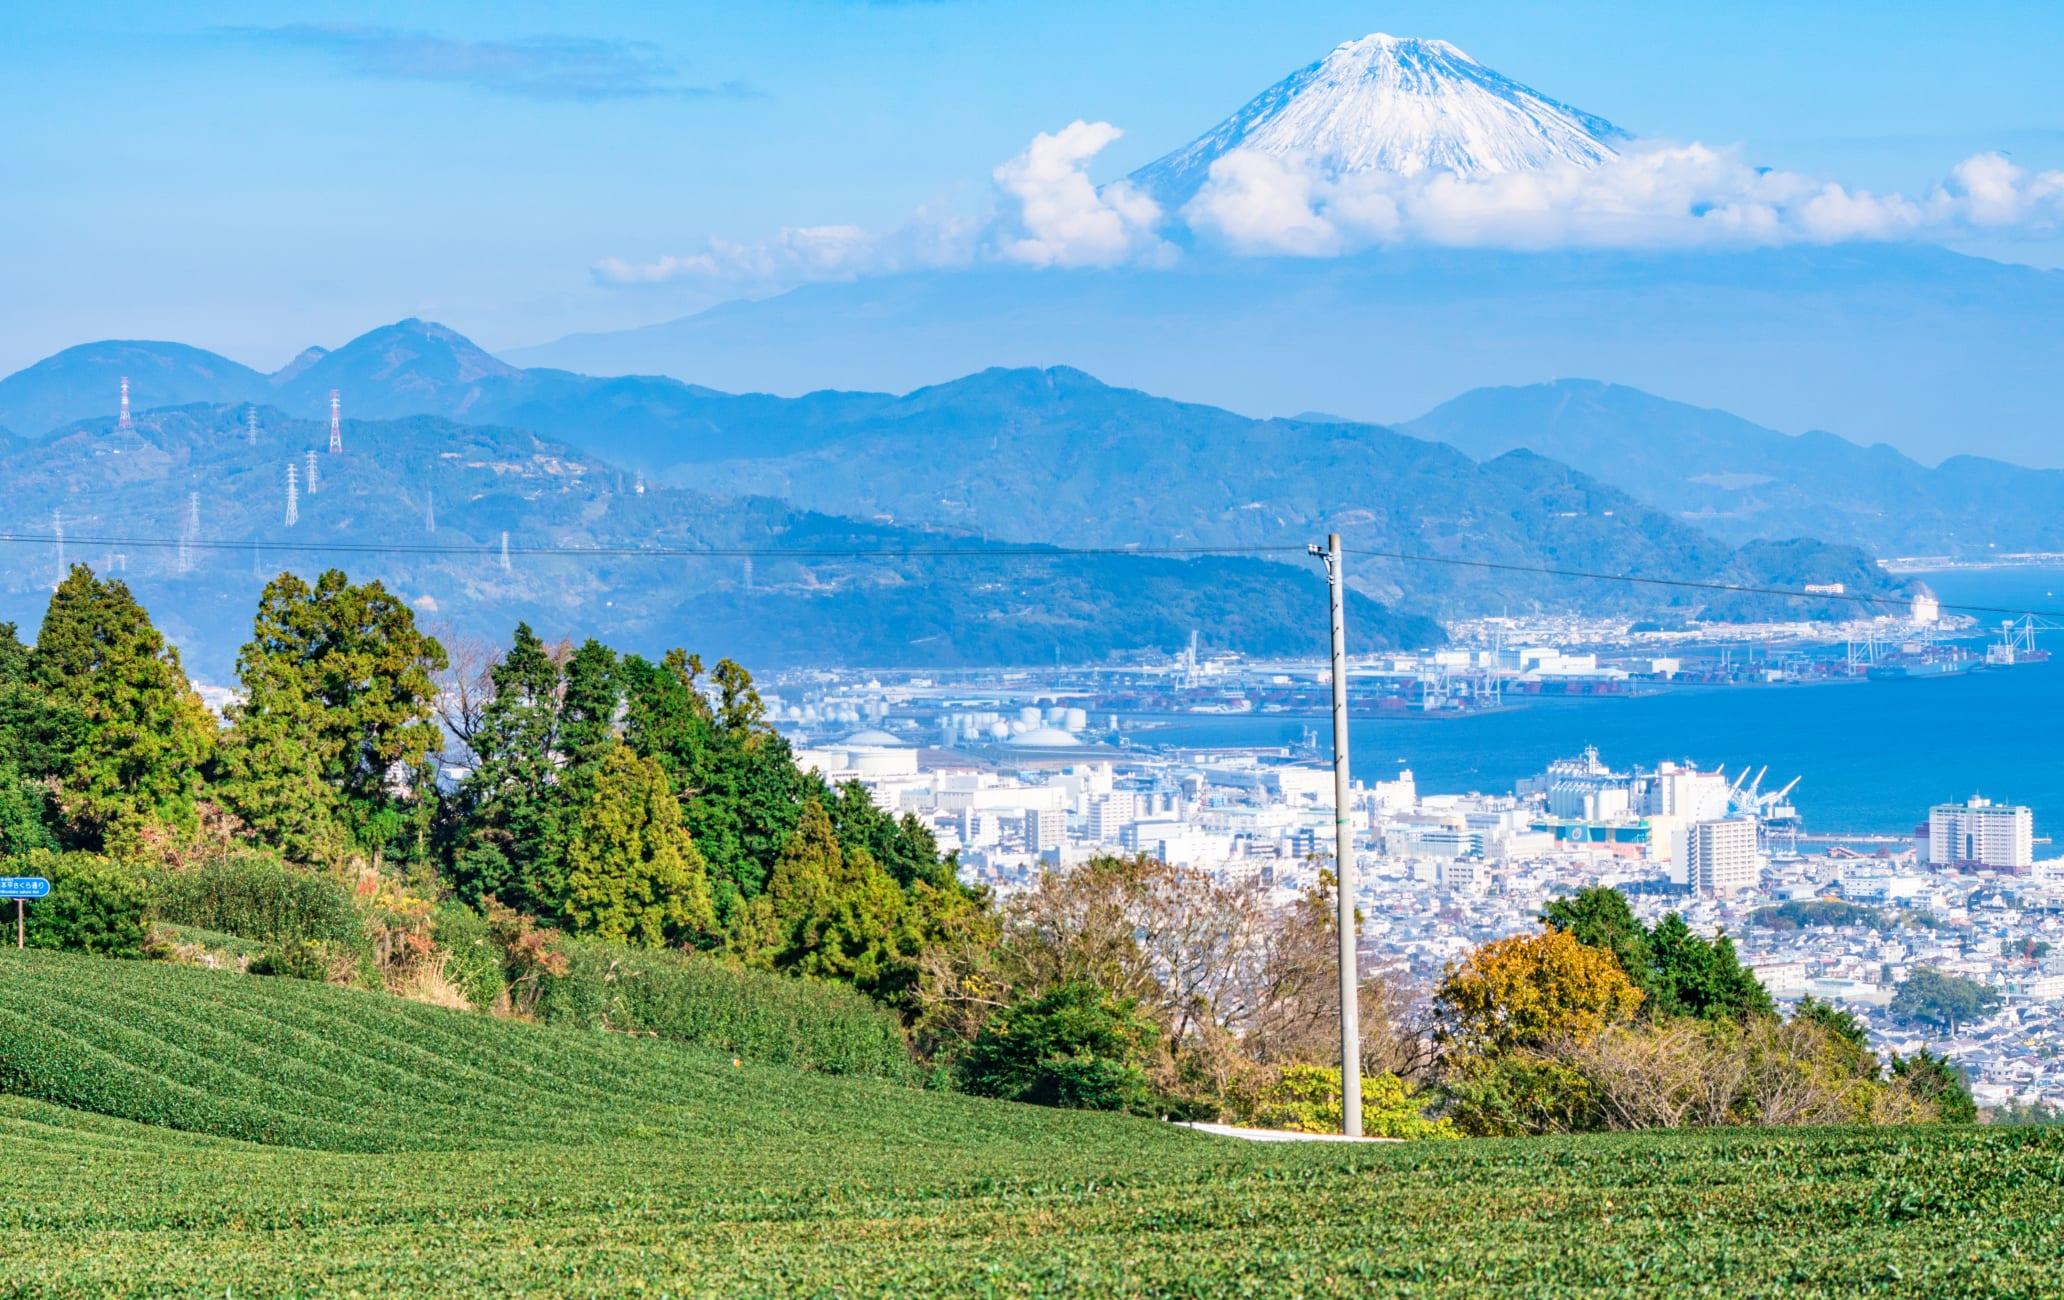 Nihon-daira Plateau Area